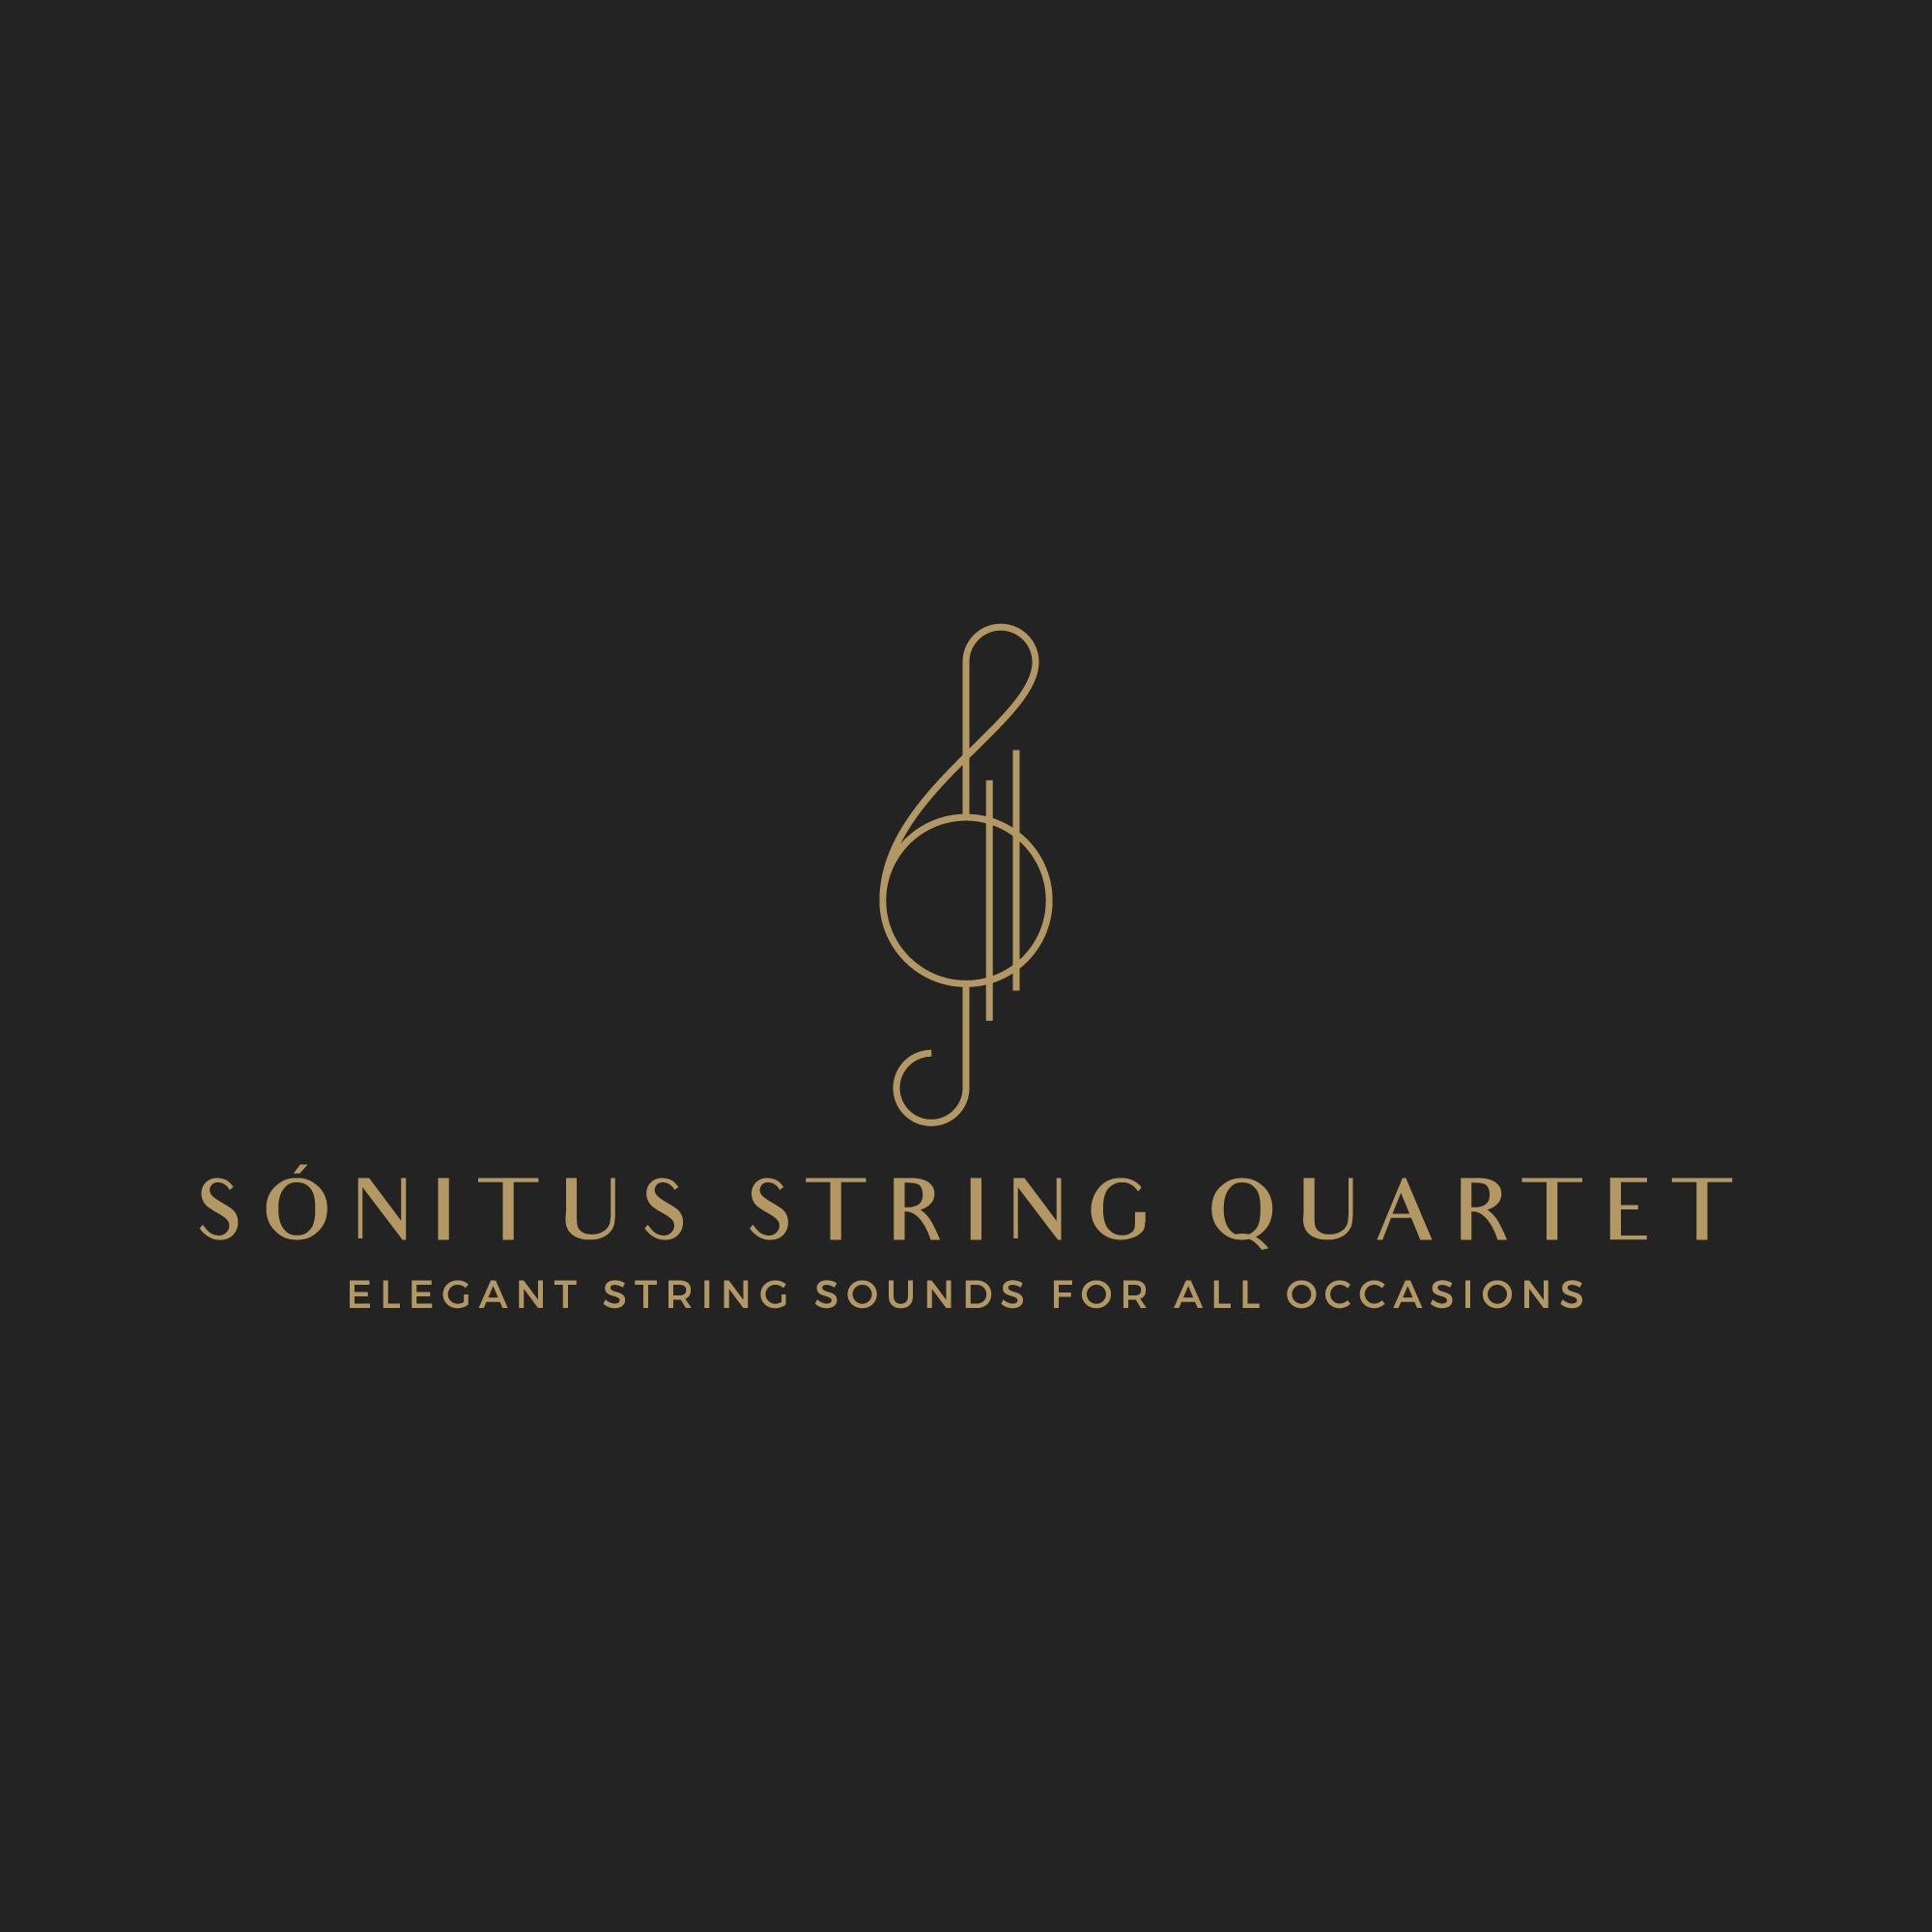 Sónitus String Quartet